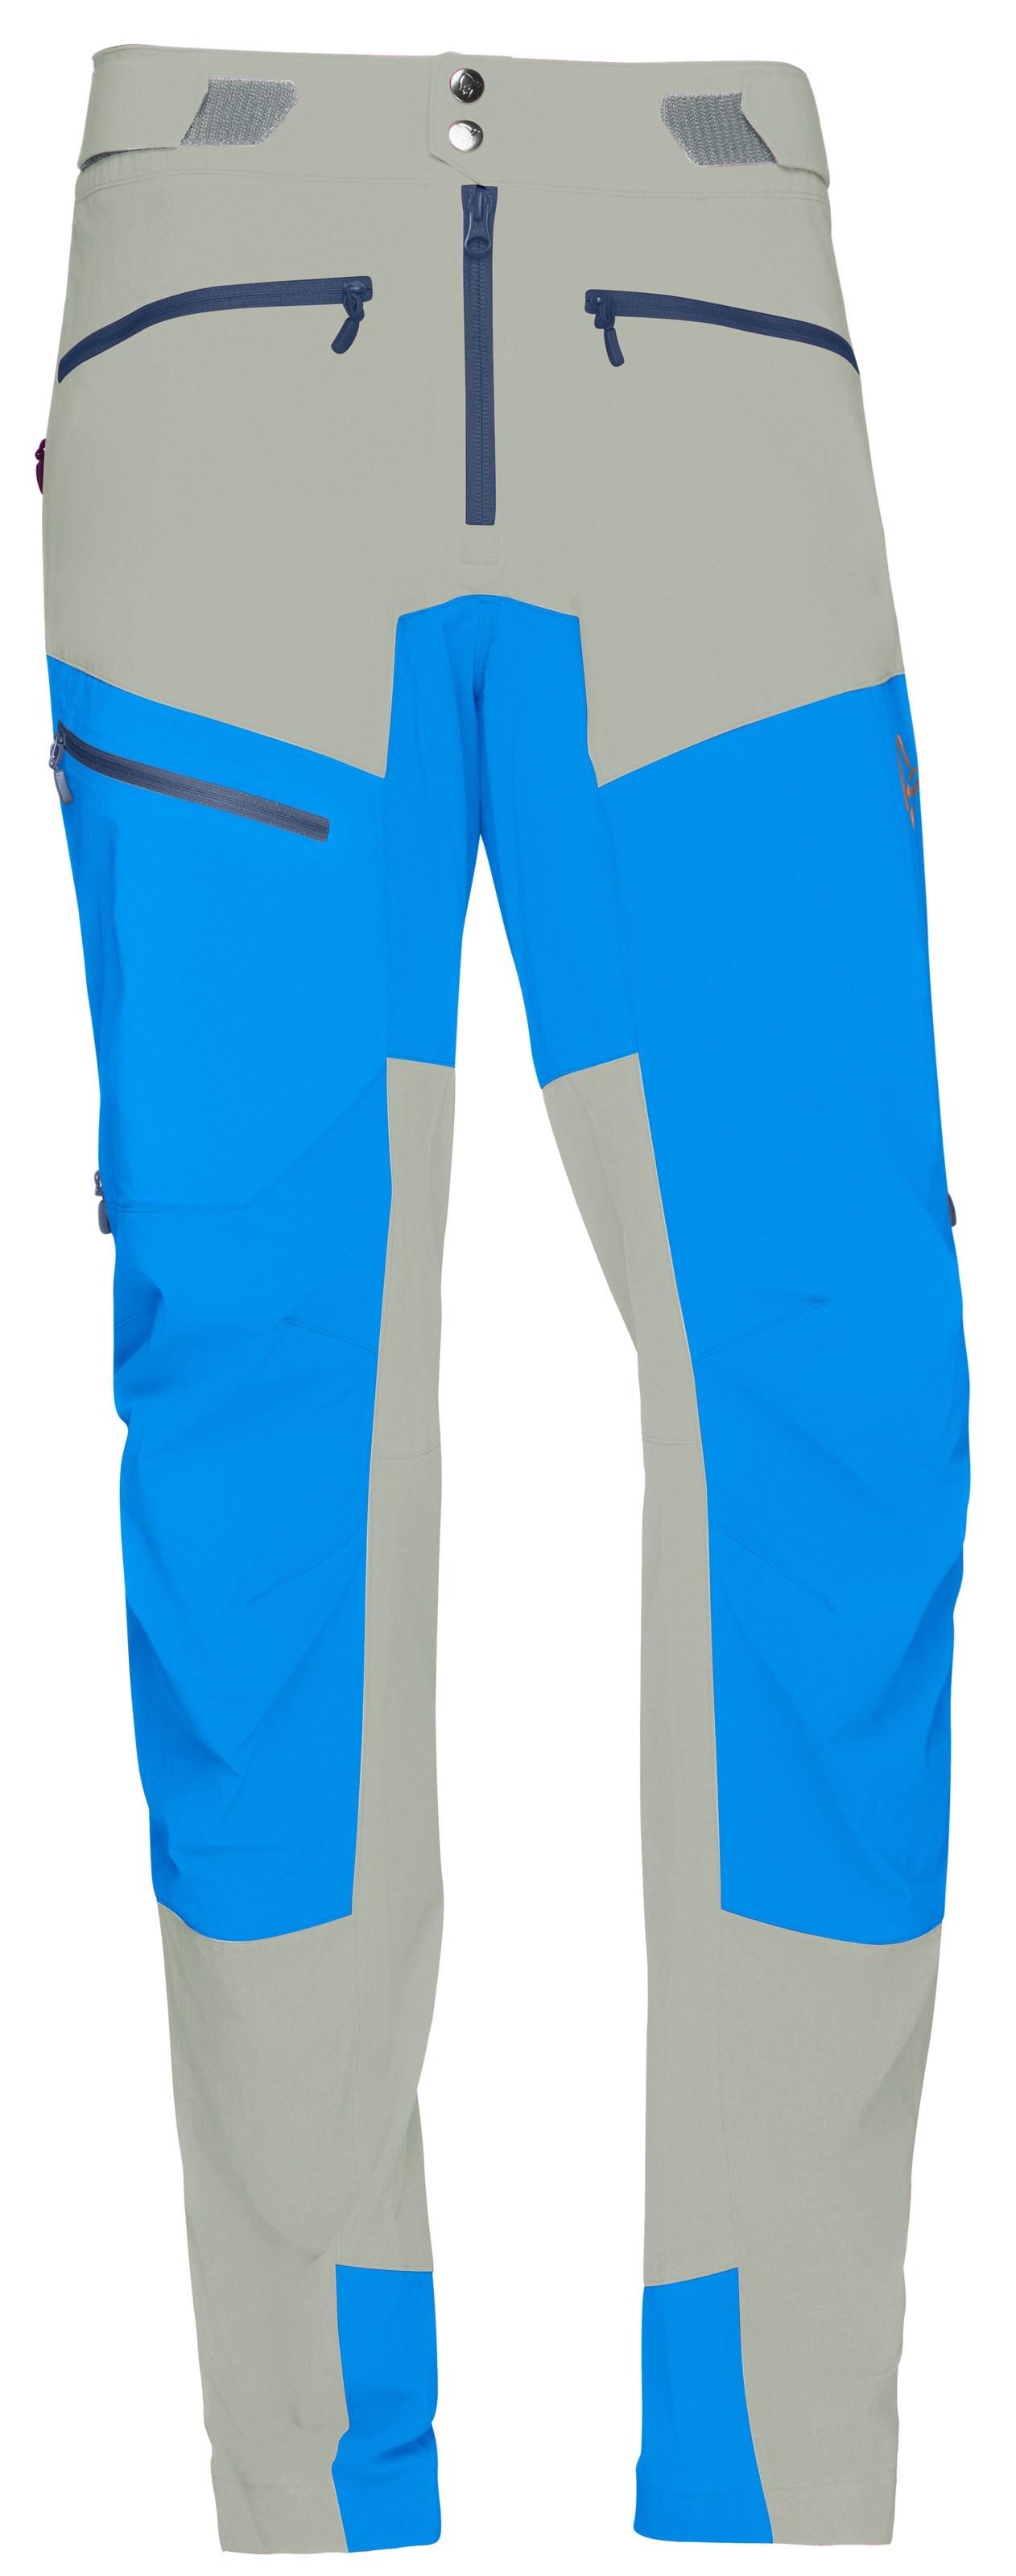 82d13c34 ... Bilde: Norrøna Fjørå flex1 Pants, softshellbukse herre - Castor  Grey/Hot Sapphire 2211 ...